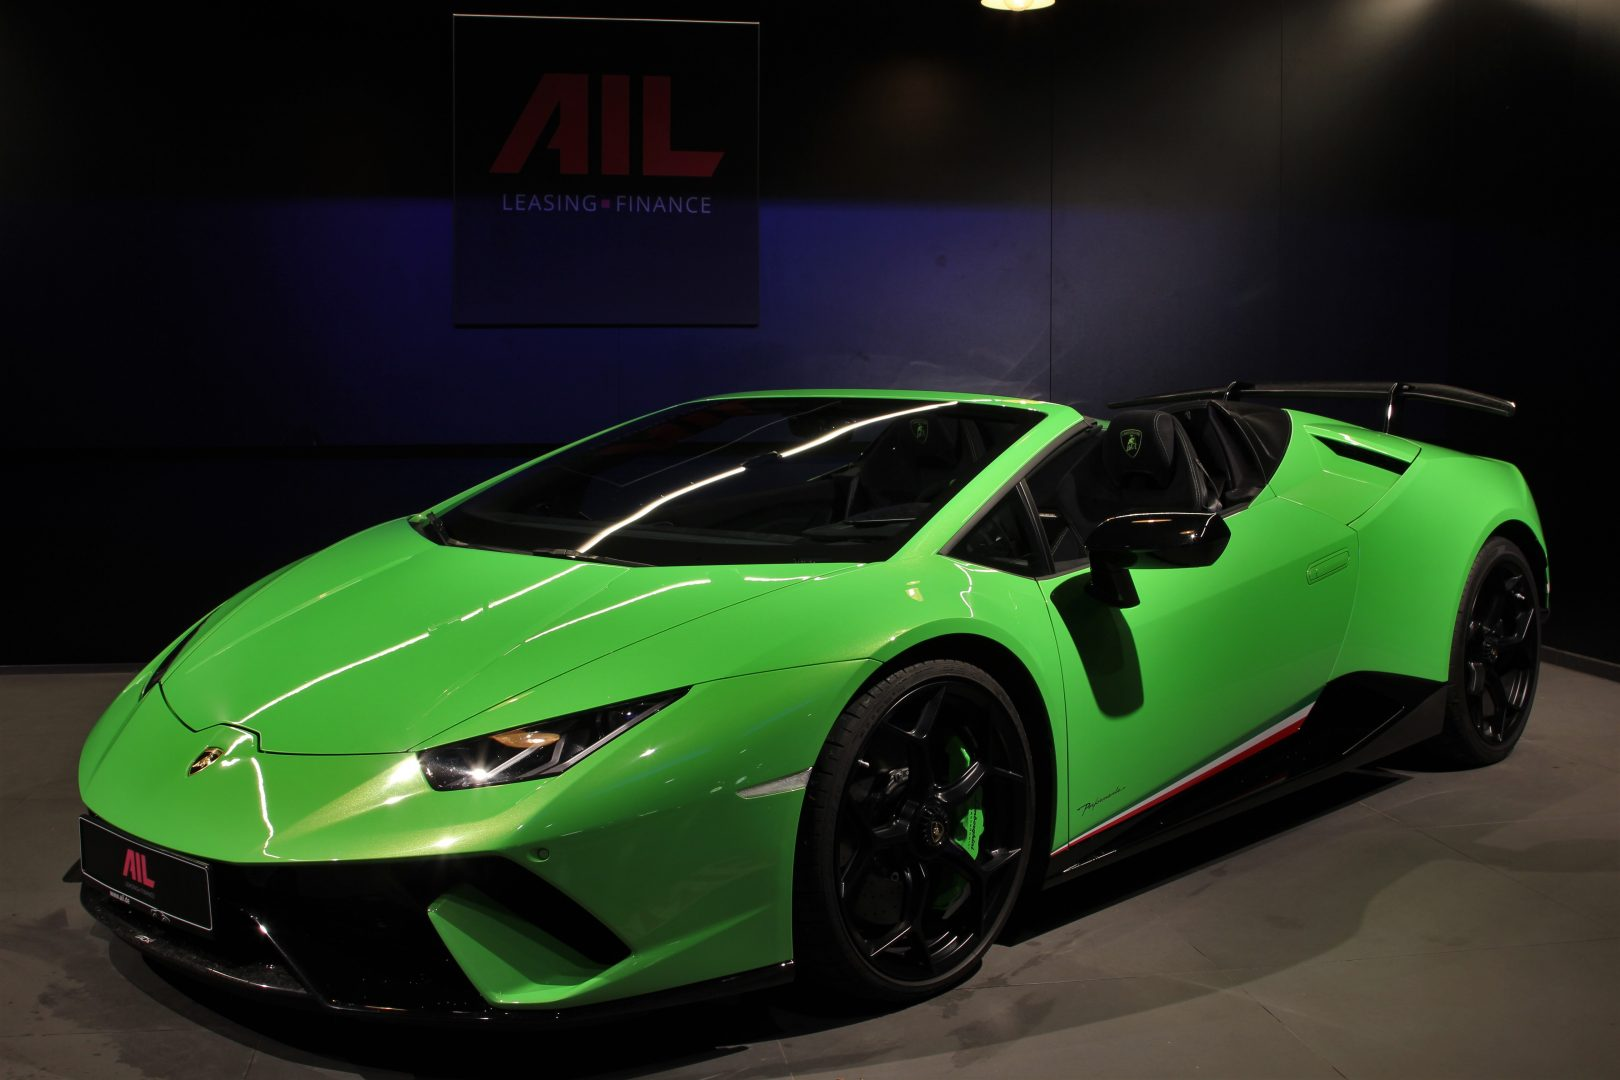 AIL Lamborghini Huracan Performante Spyder LP 640-4 Verda Mantis 15